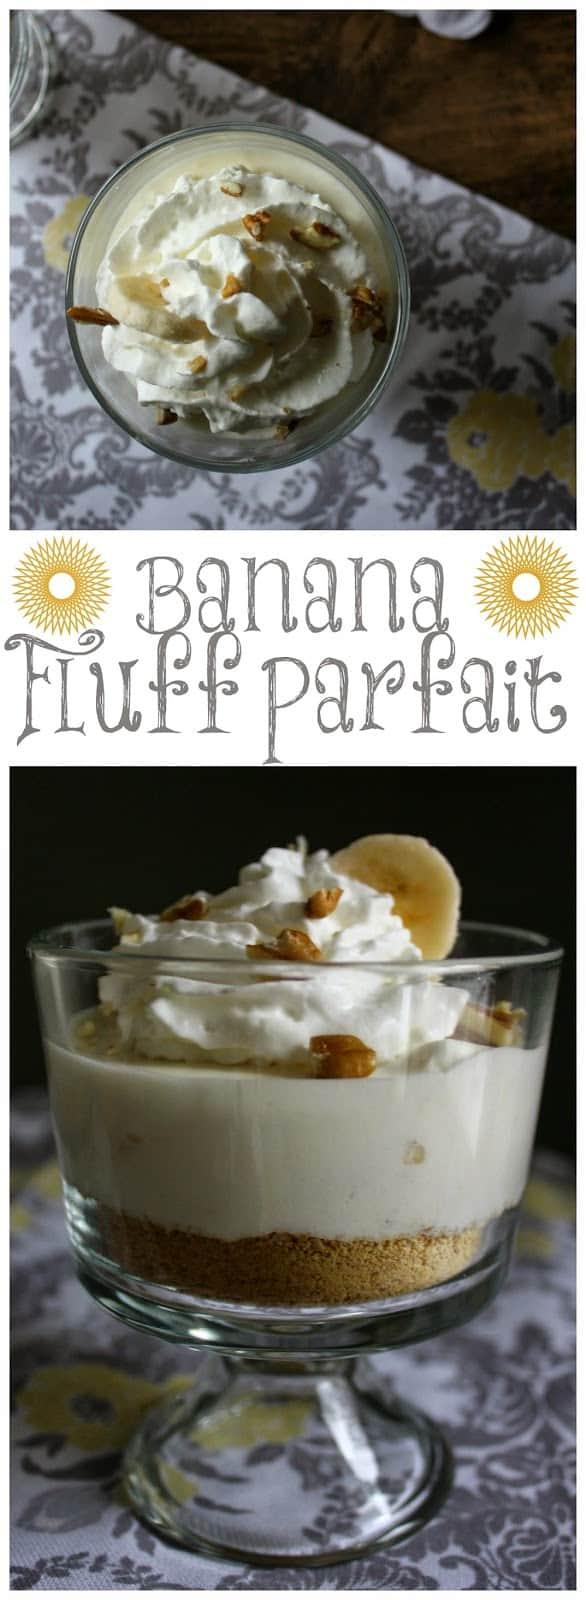 Banana Fluff Parfait